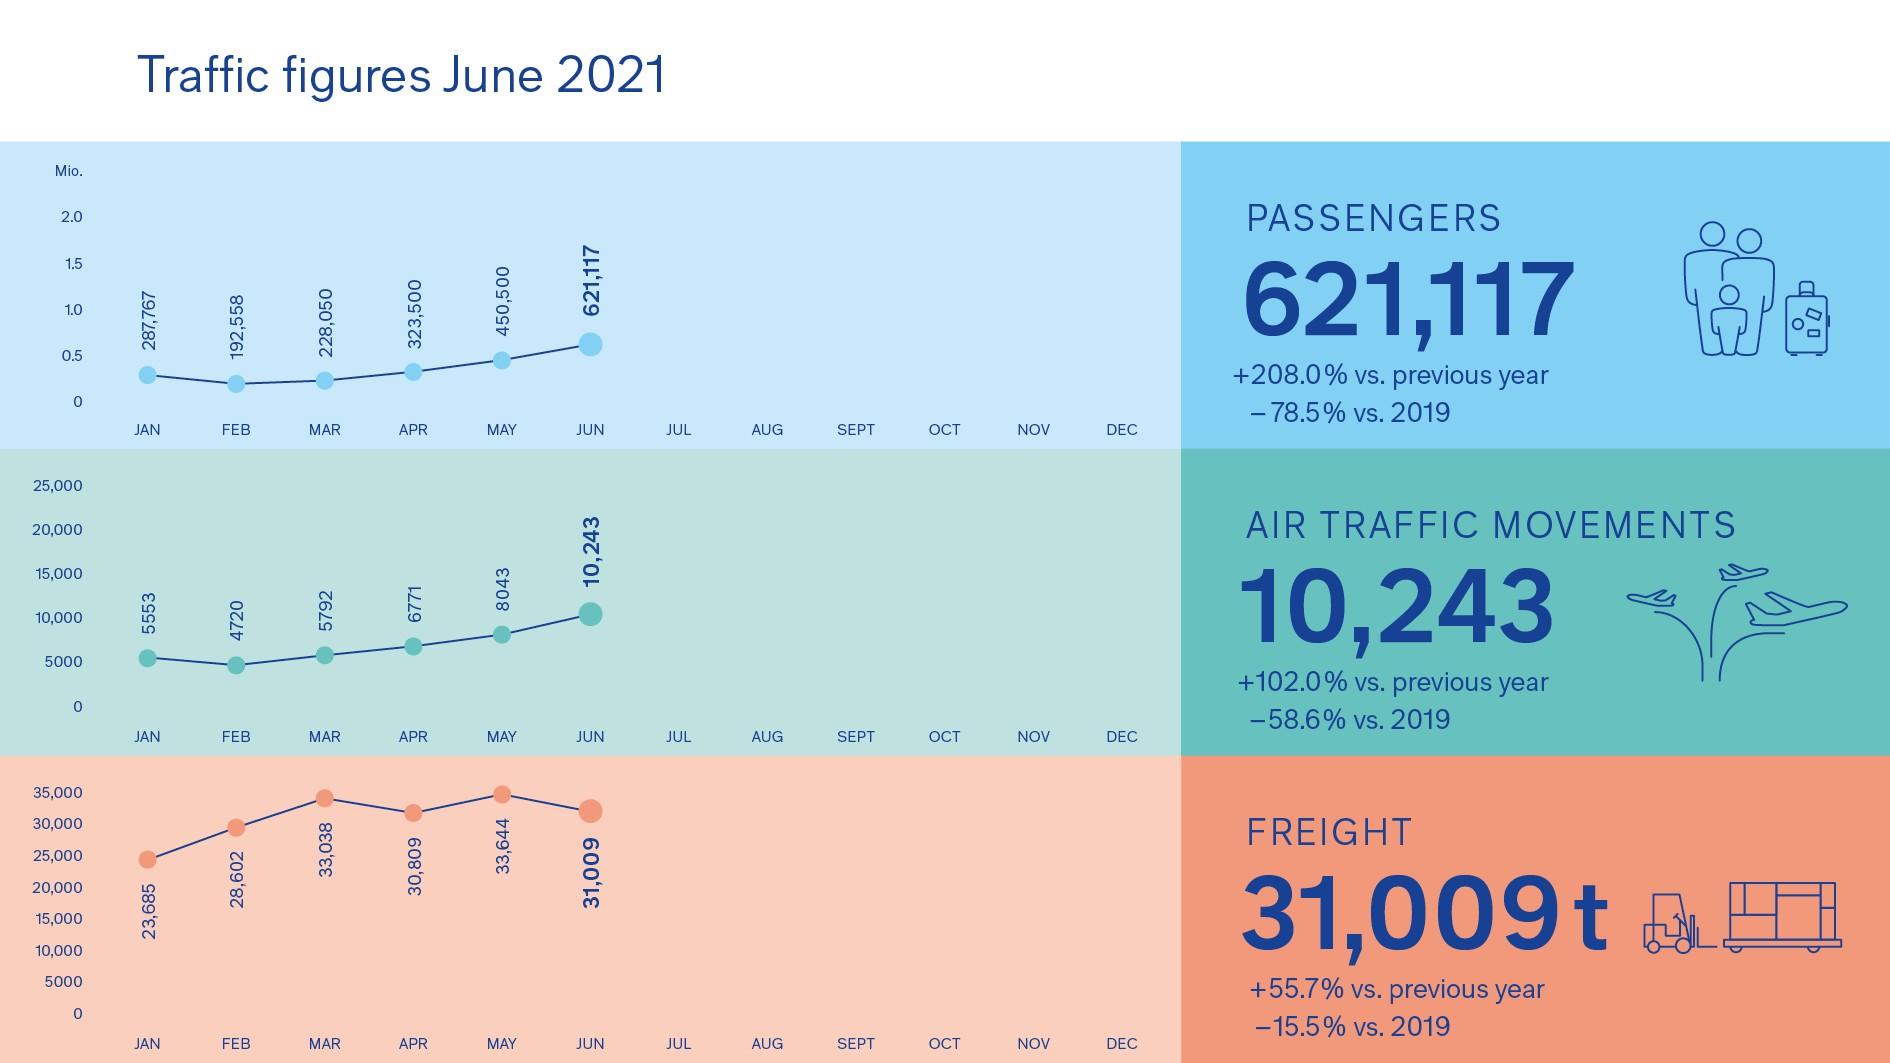 210712_Grafik_Verkehrszahlen_2021-06_EN